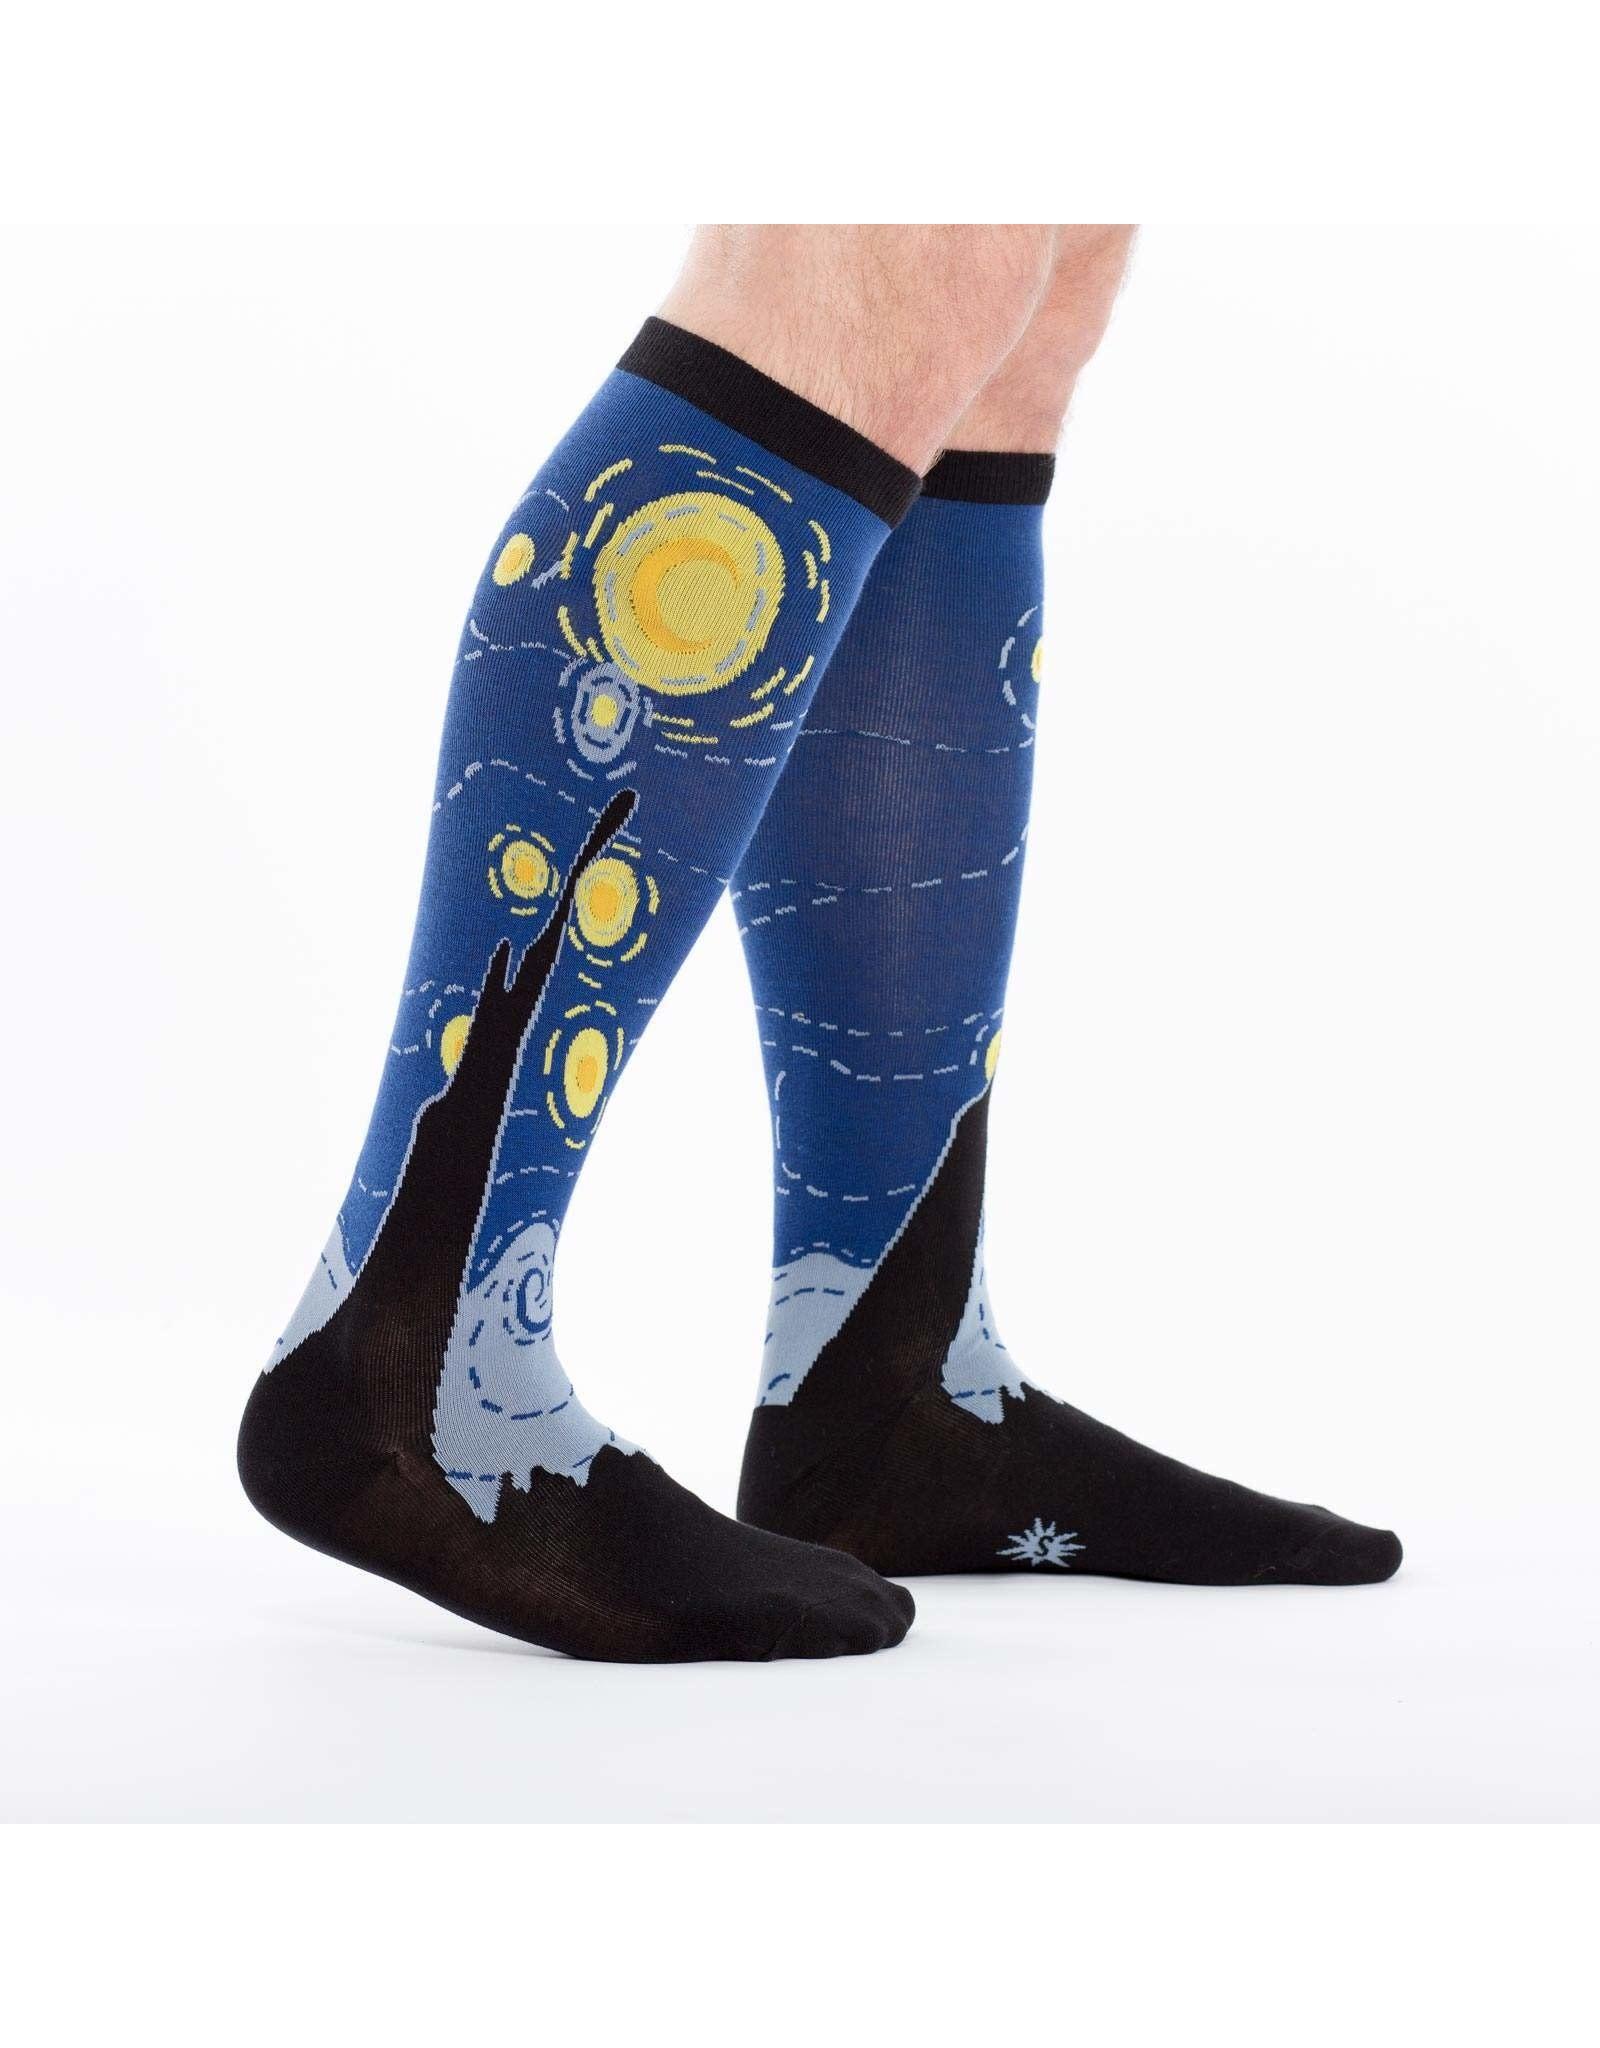 SOCK IT TO ME - Stretch-It Knee High Starry Night Socks